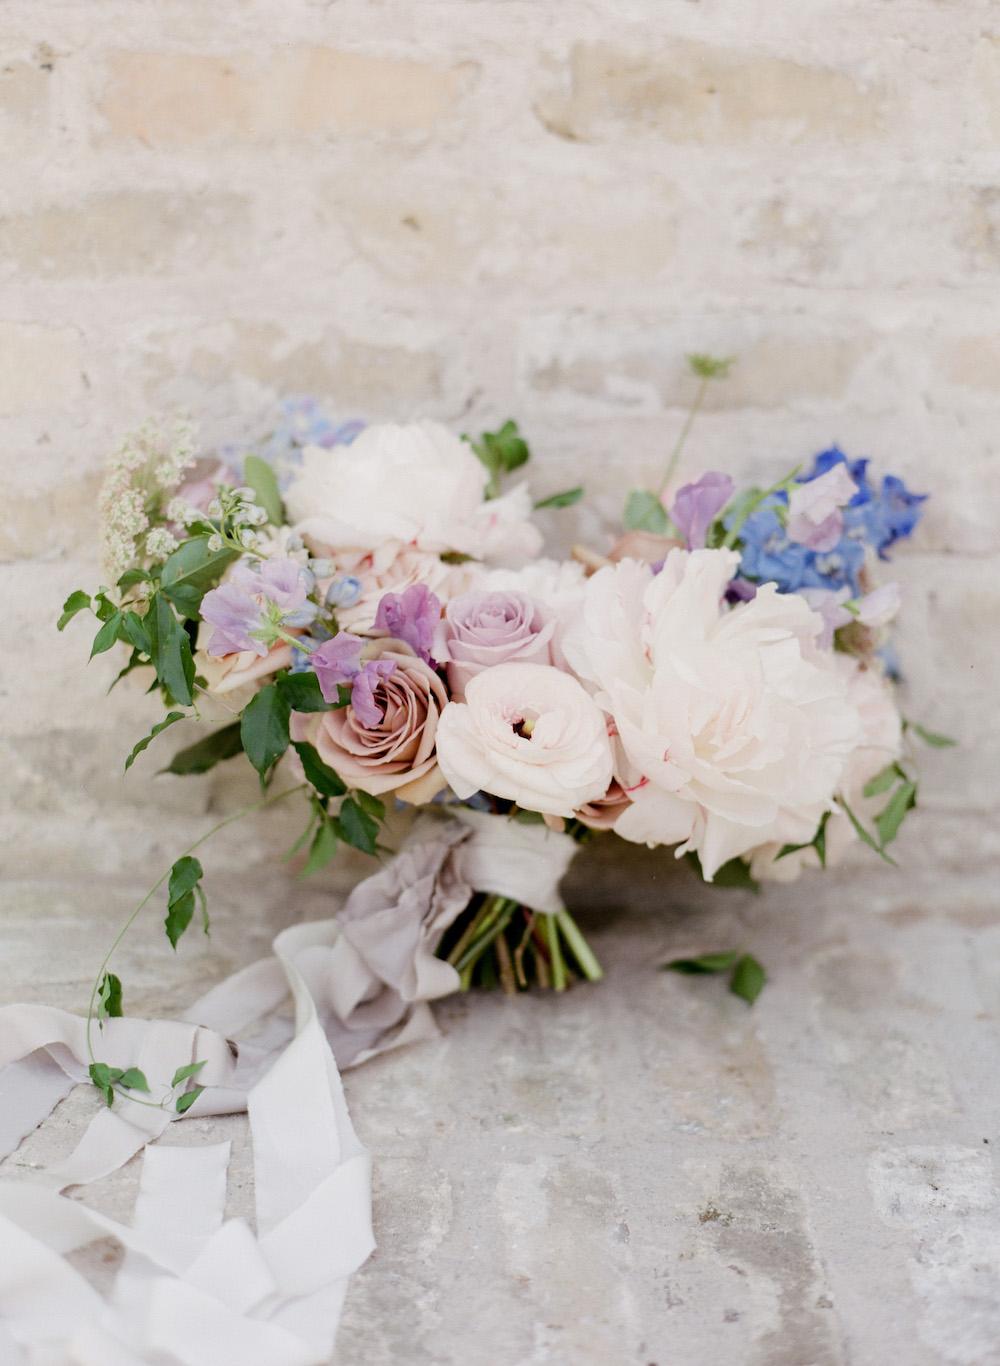 Pastel Bridal Bouquet - Stone House Creative